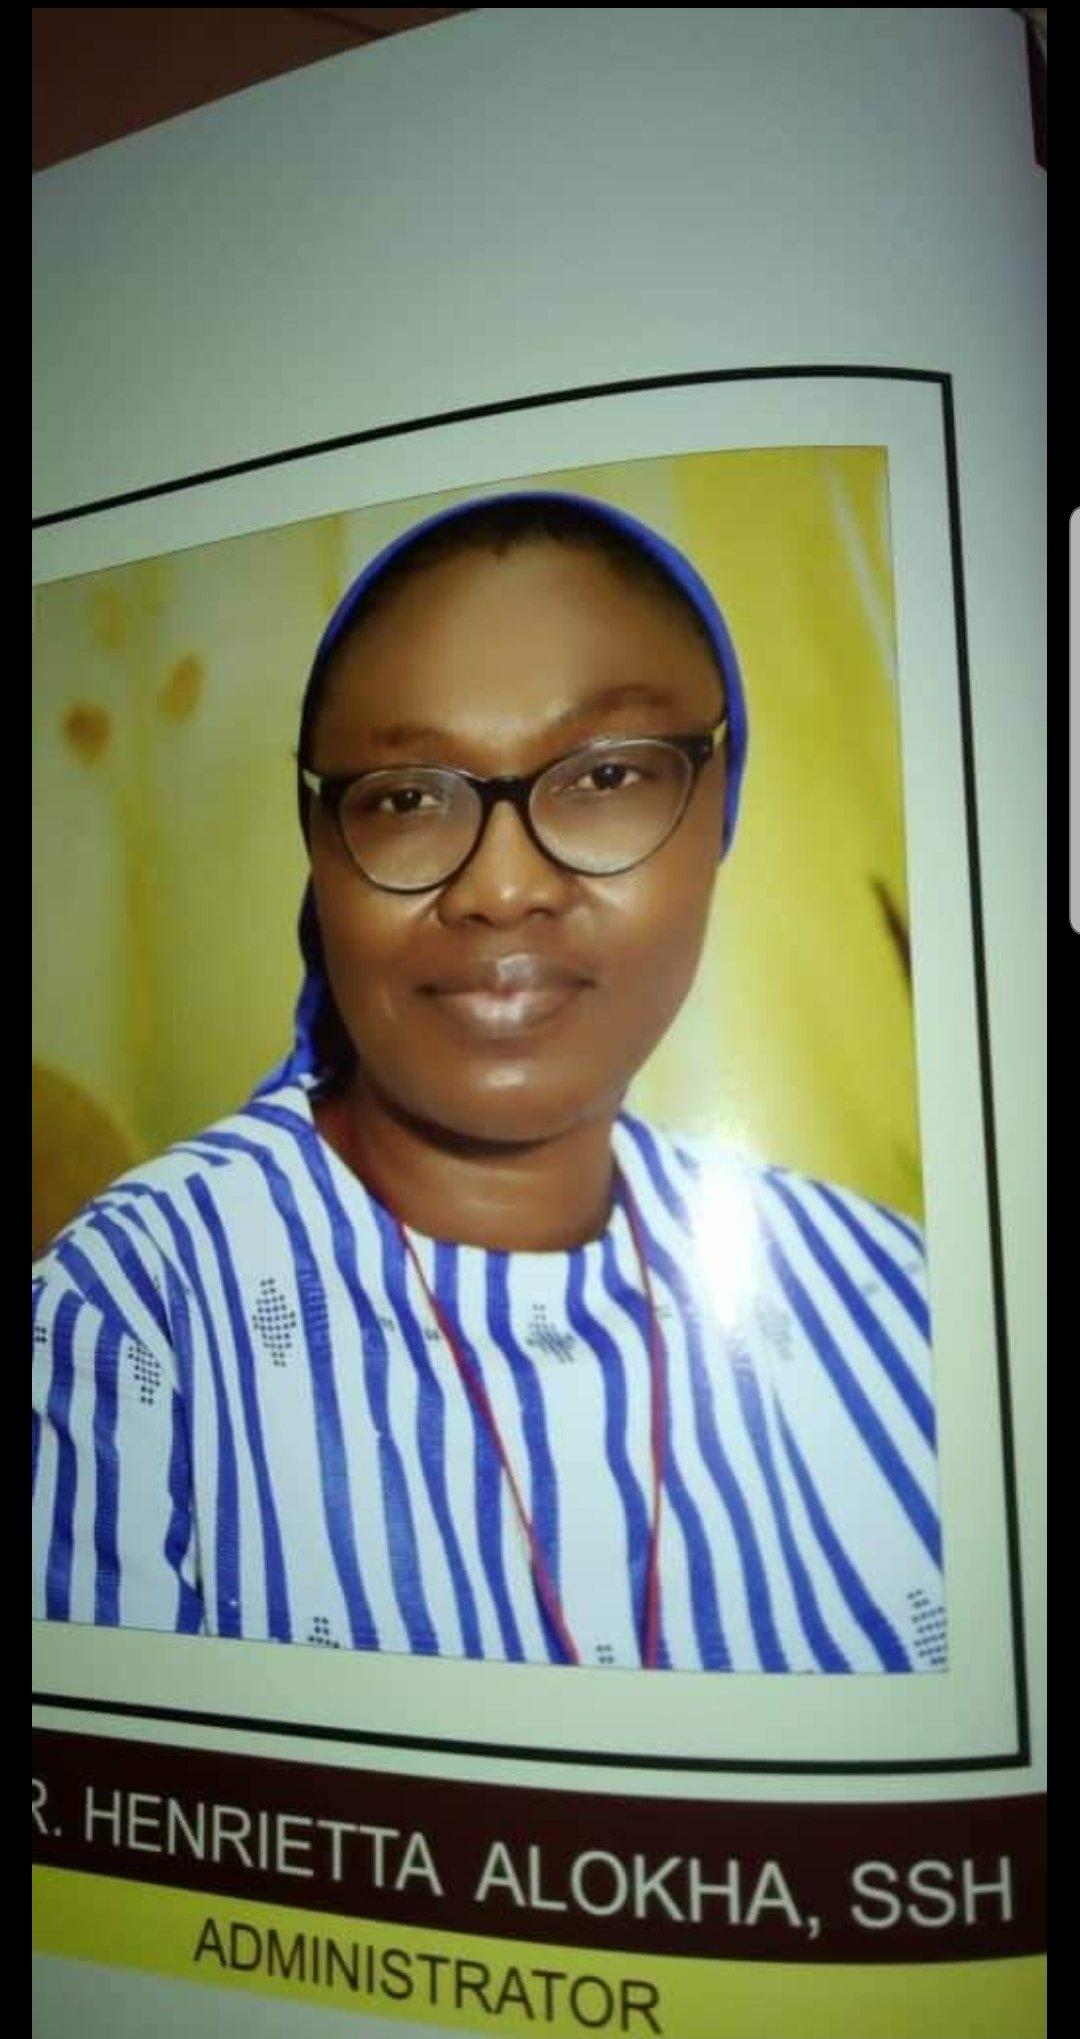 Bethlehem School Abule Ado principal Reverend sister Henrietta Alokha dies in Lagos factory explosion 1